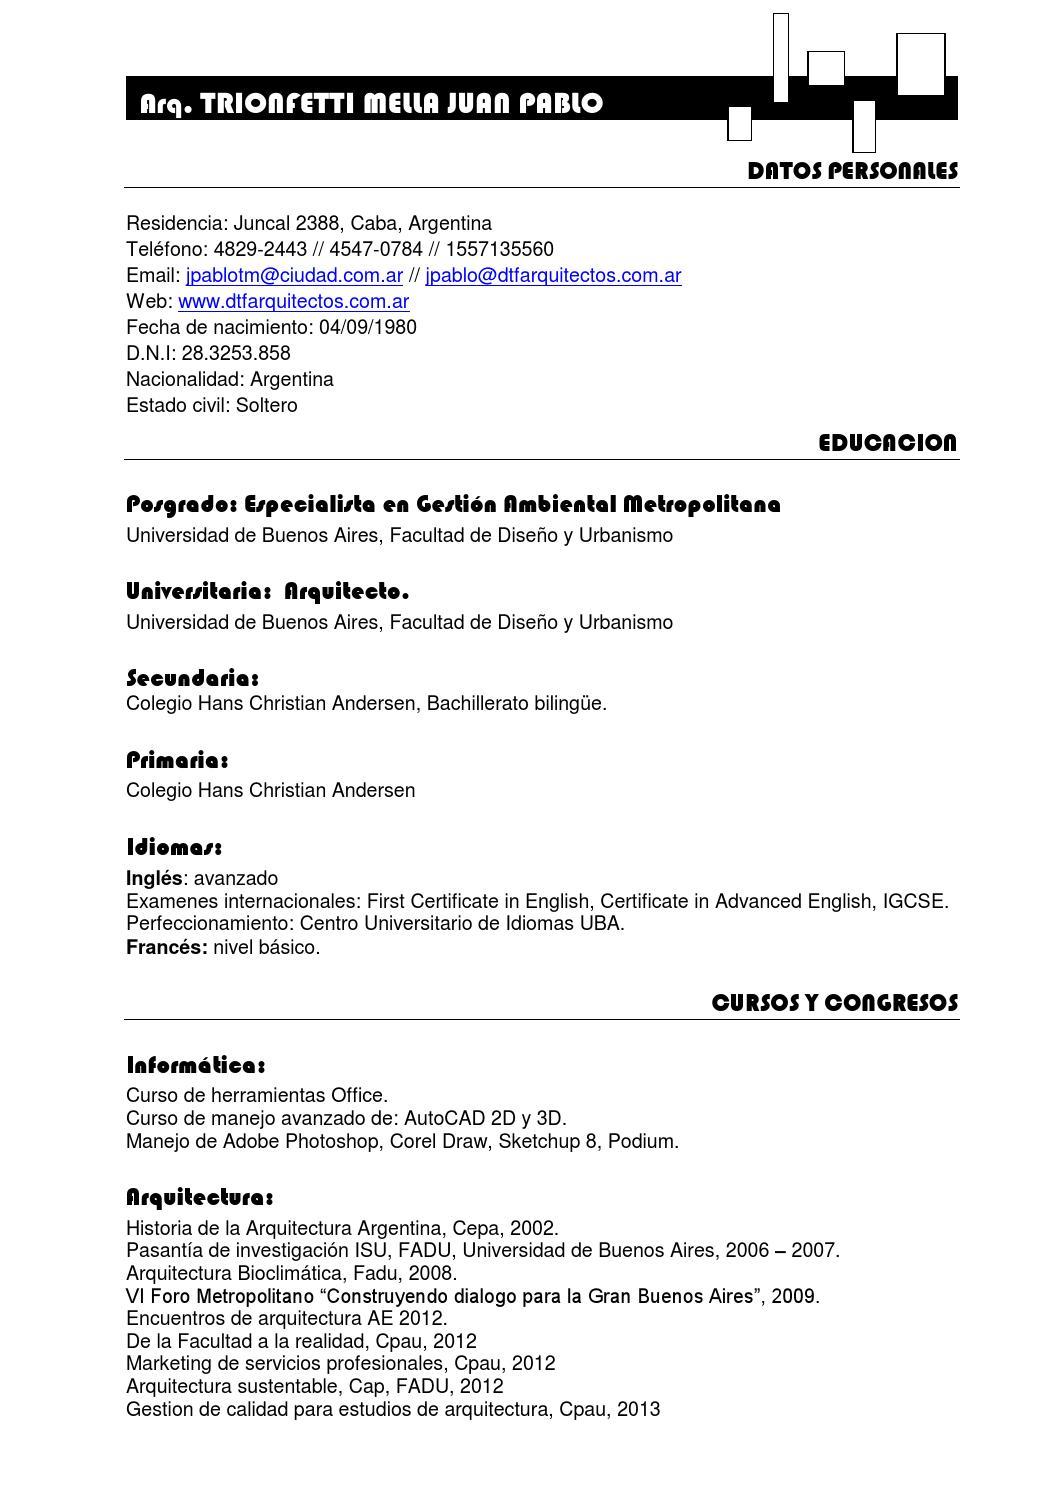 curriculum vitae by juan pablo trionfetti mella